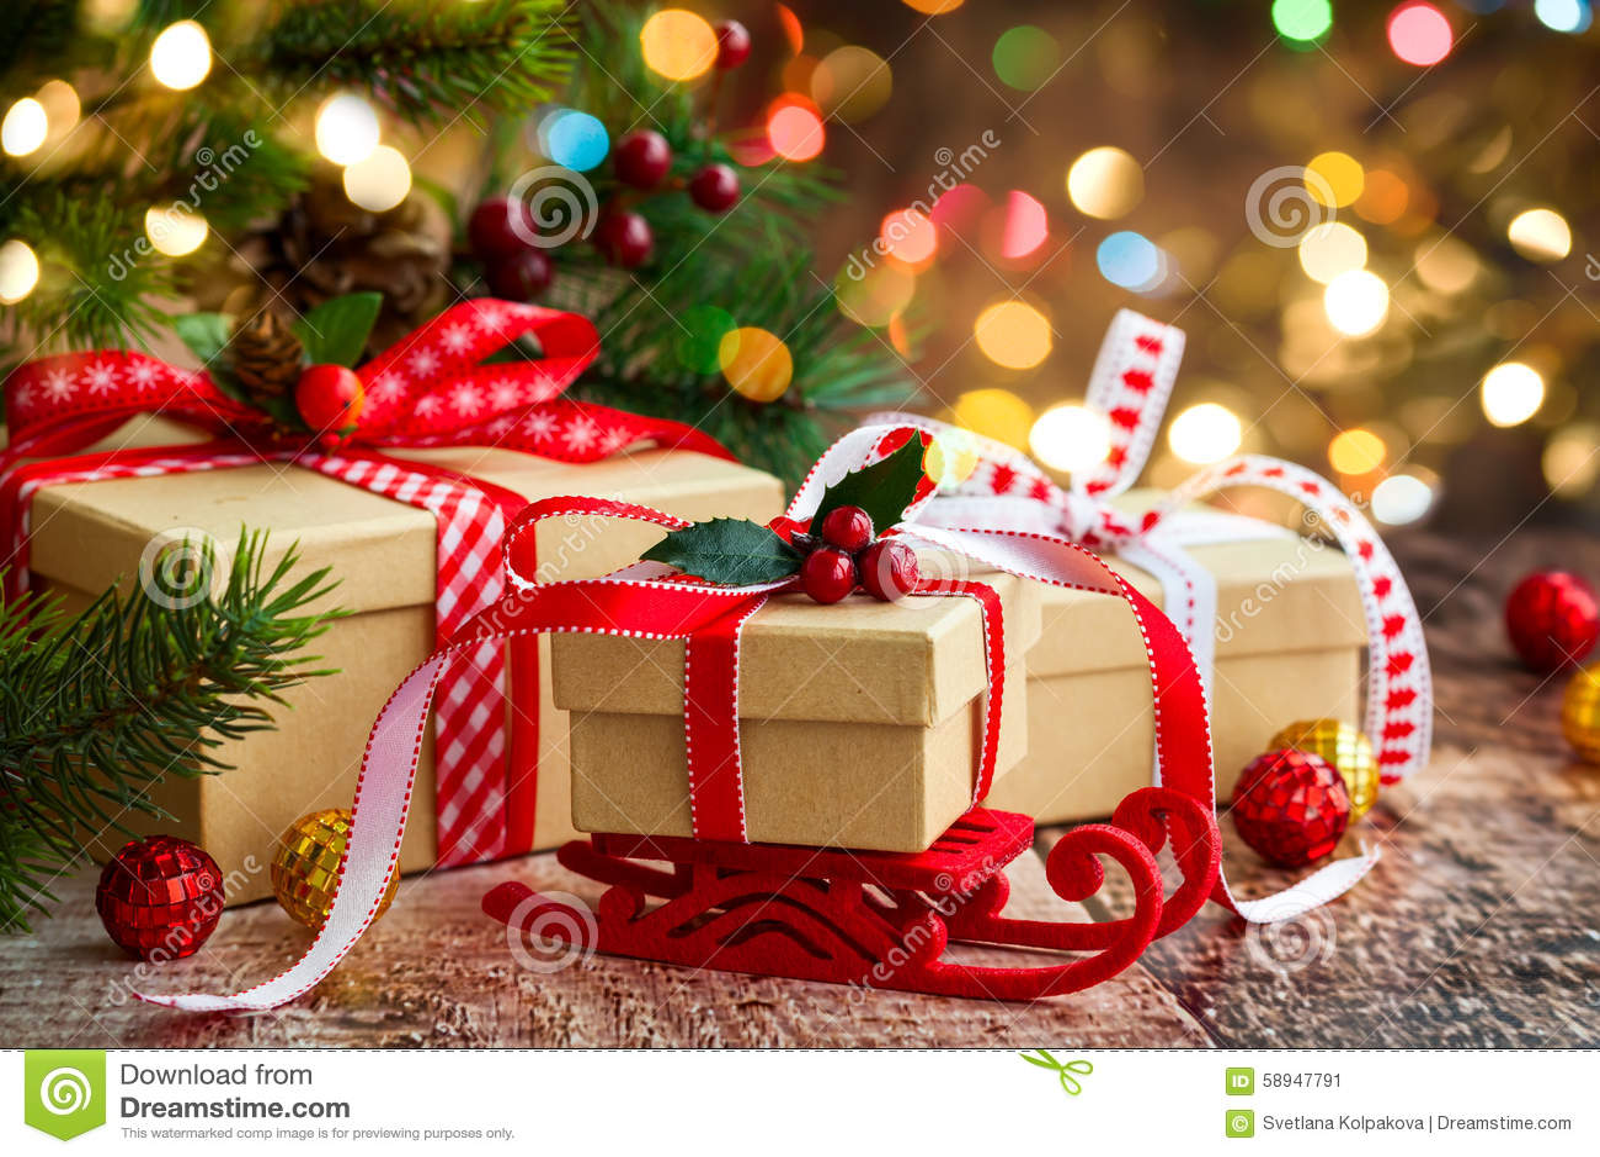 Aktuell weihnachtspakete för jul